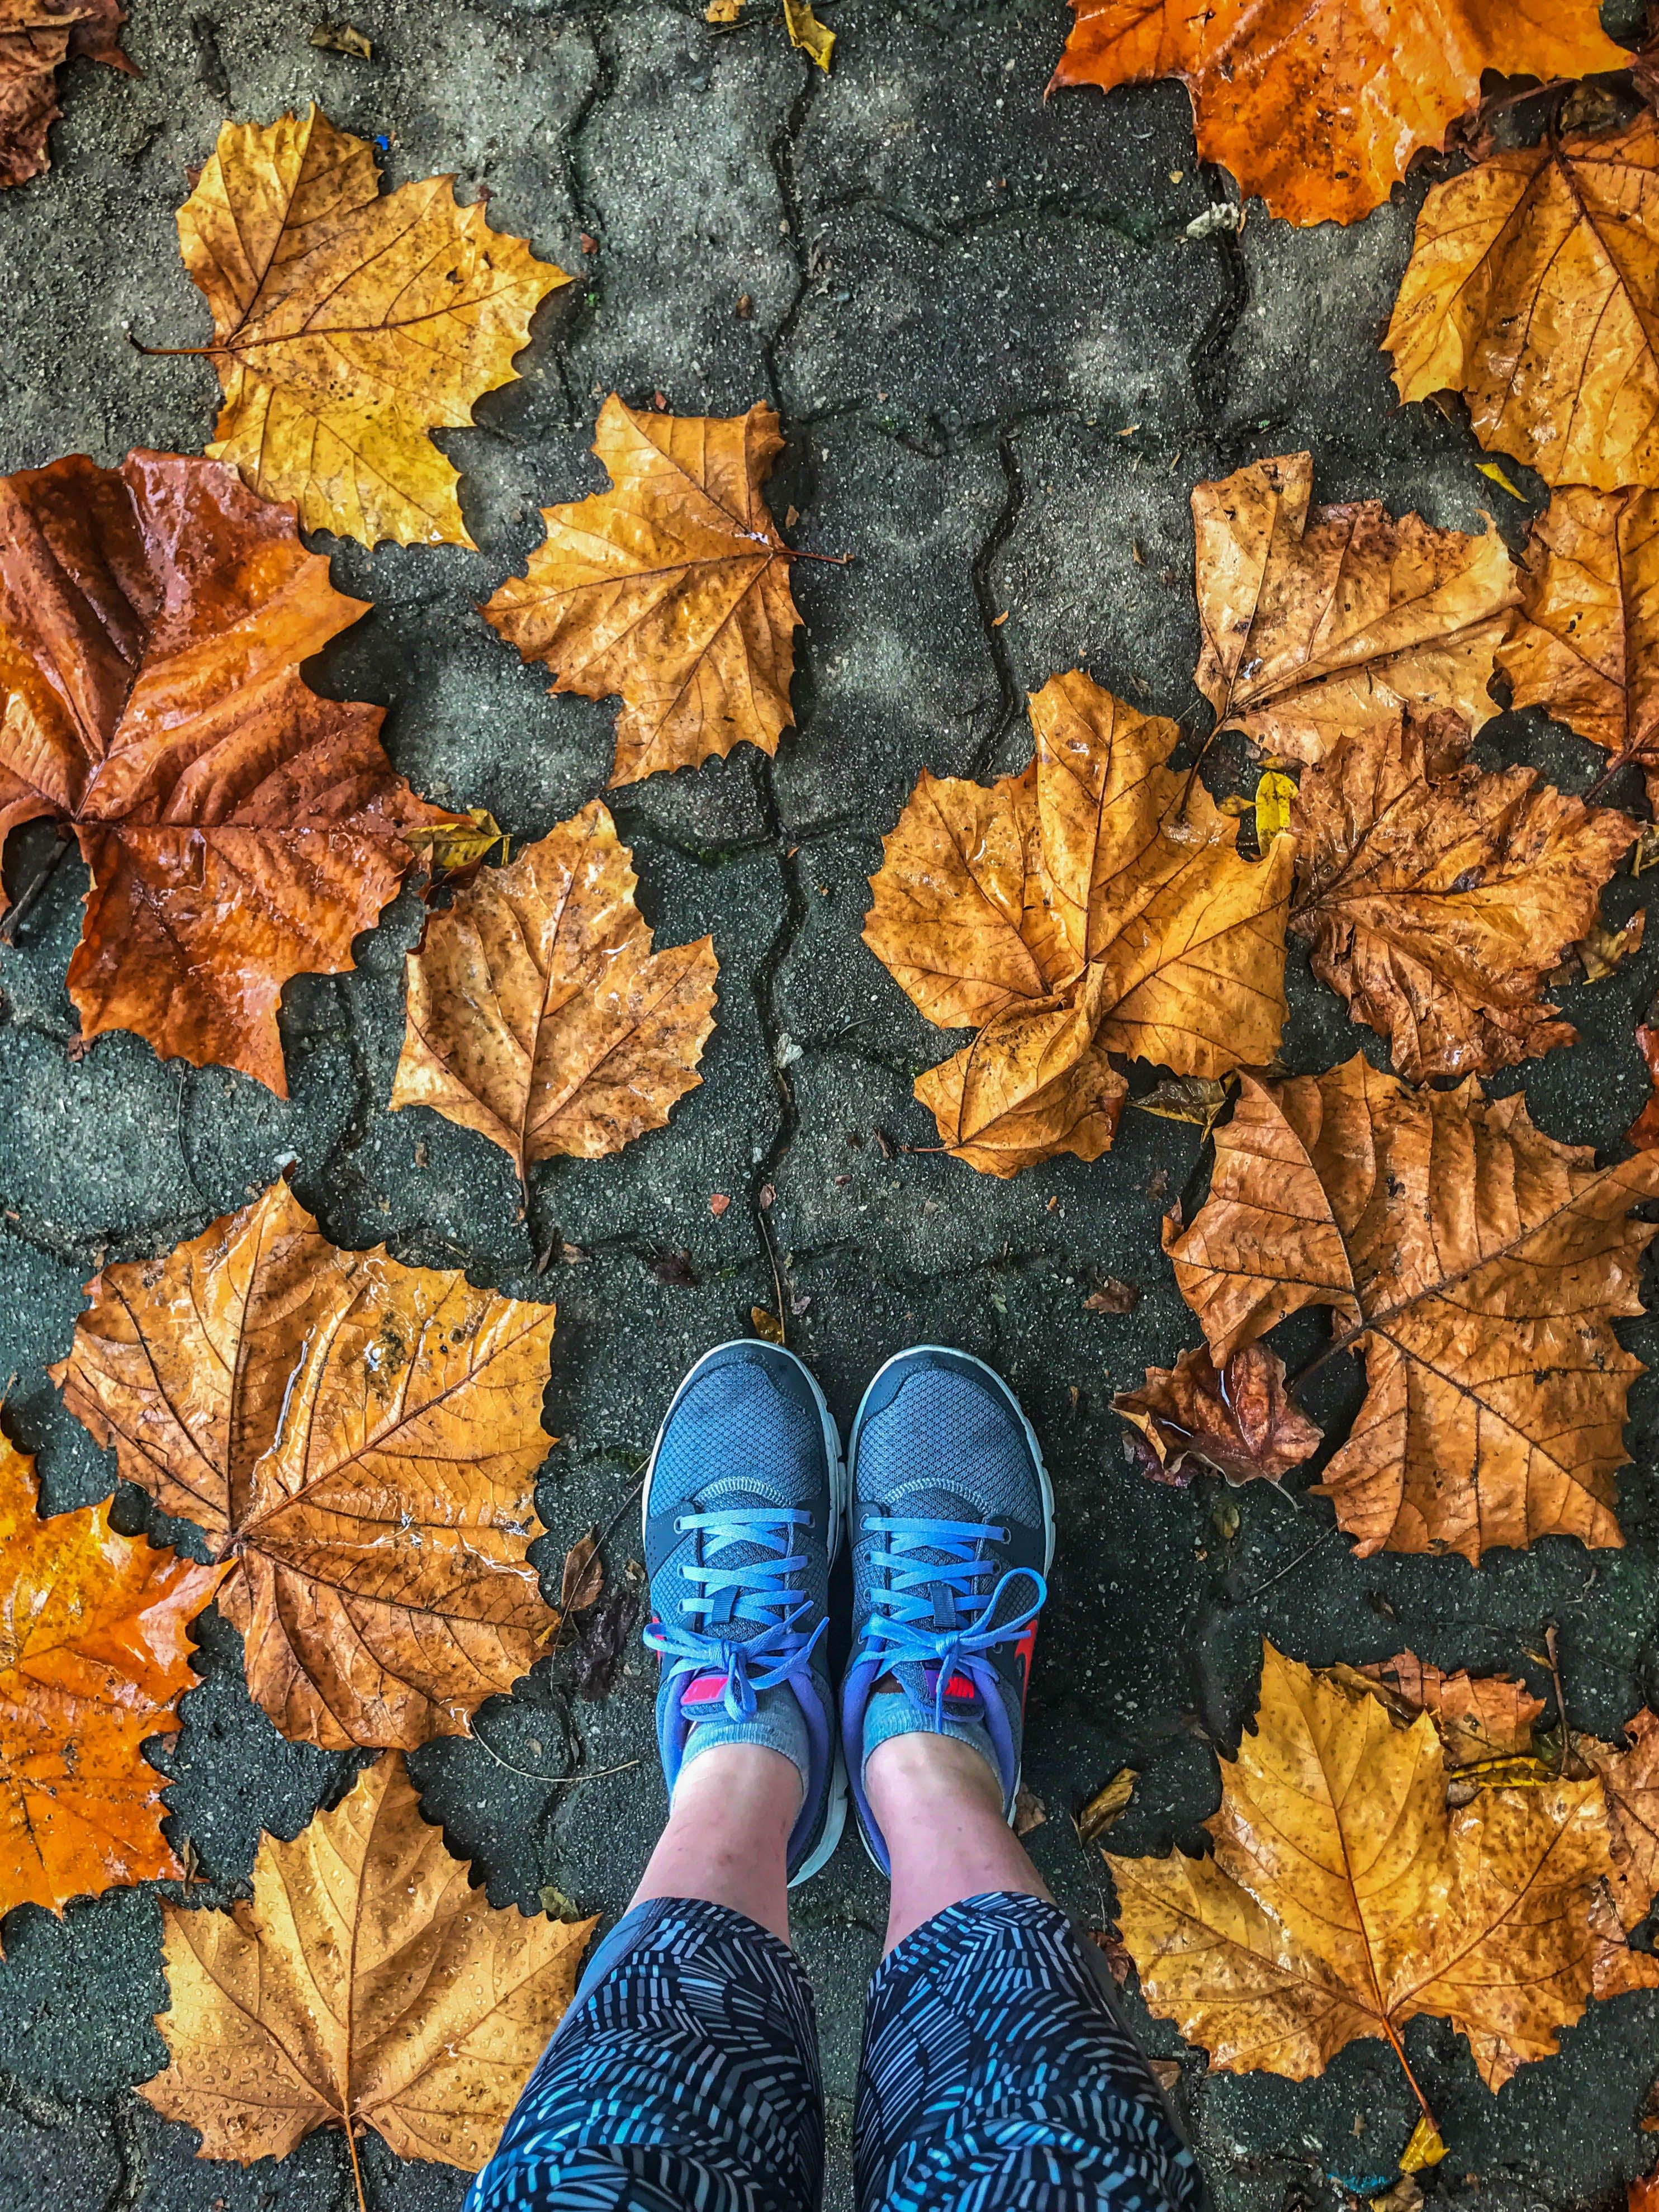 Free stock photo of #autumn, #autumnleaf, #autumnleaves, #fall